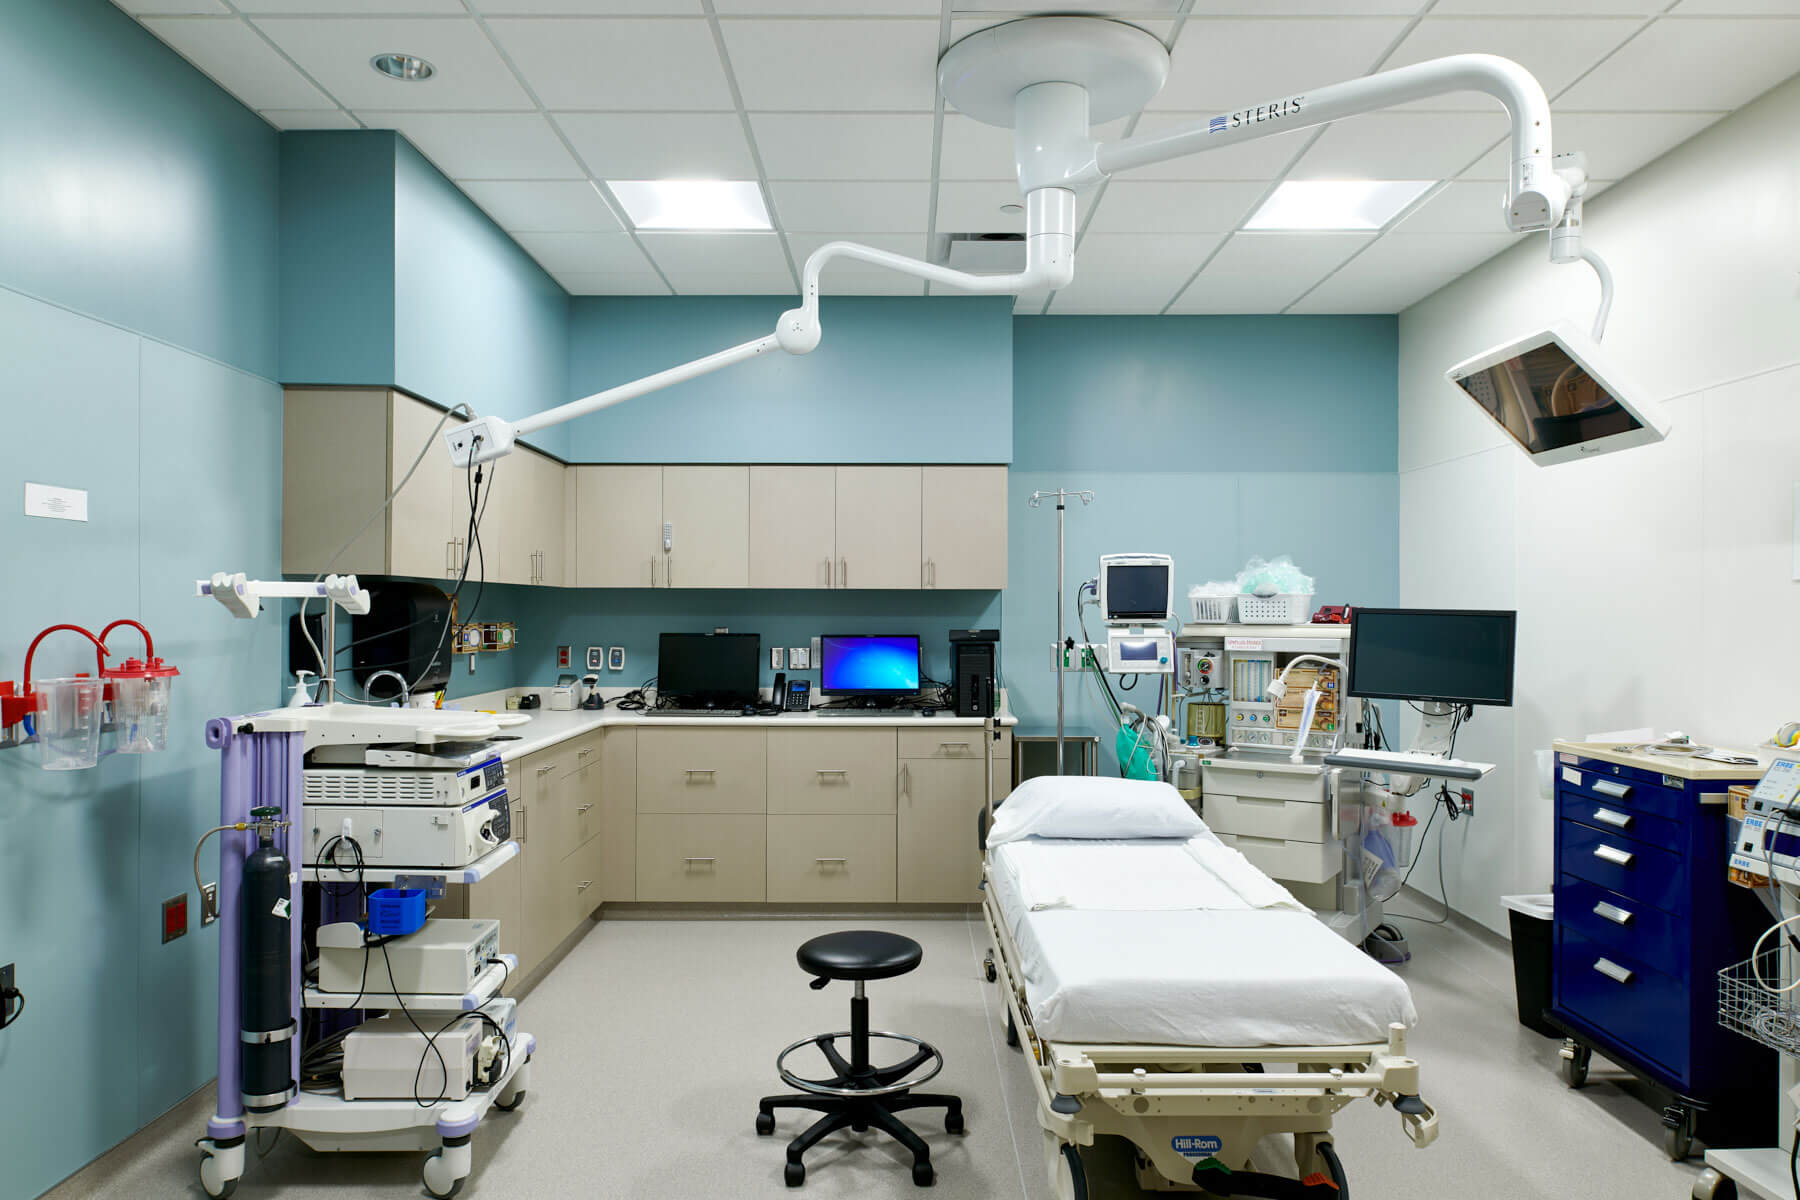 180815-Willmar_Surgery-006-S